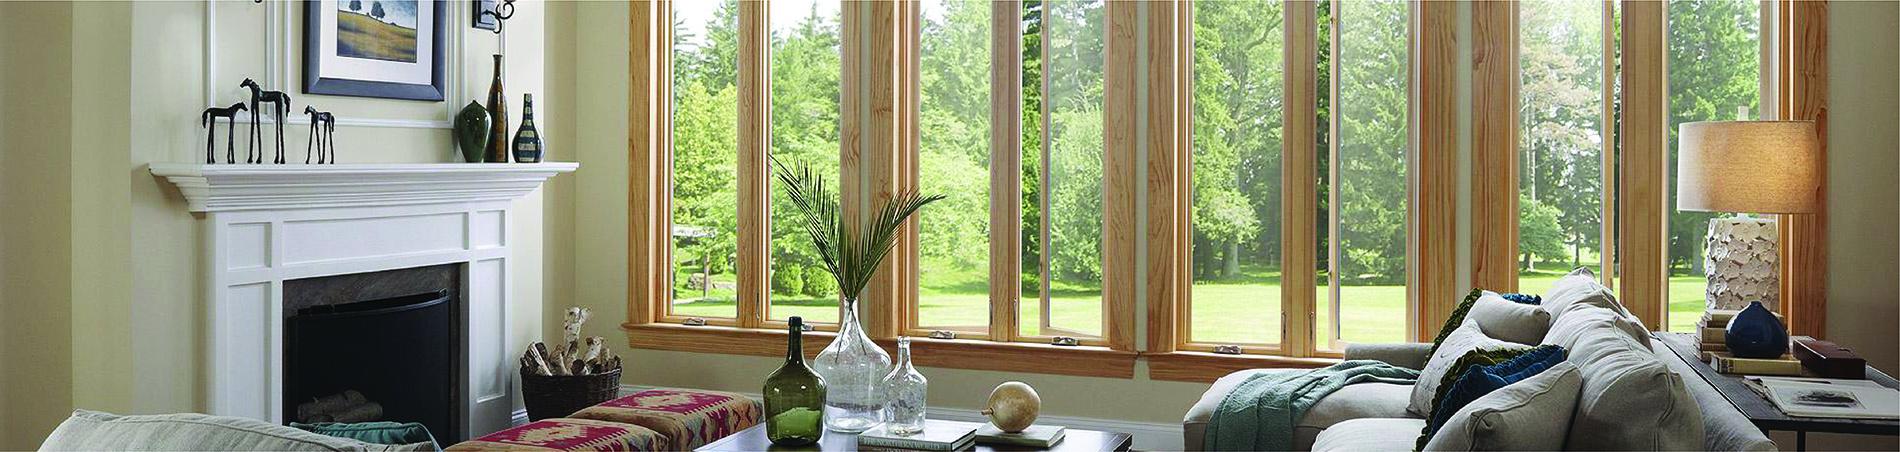 Unified Casement Windows